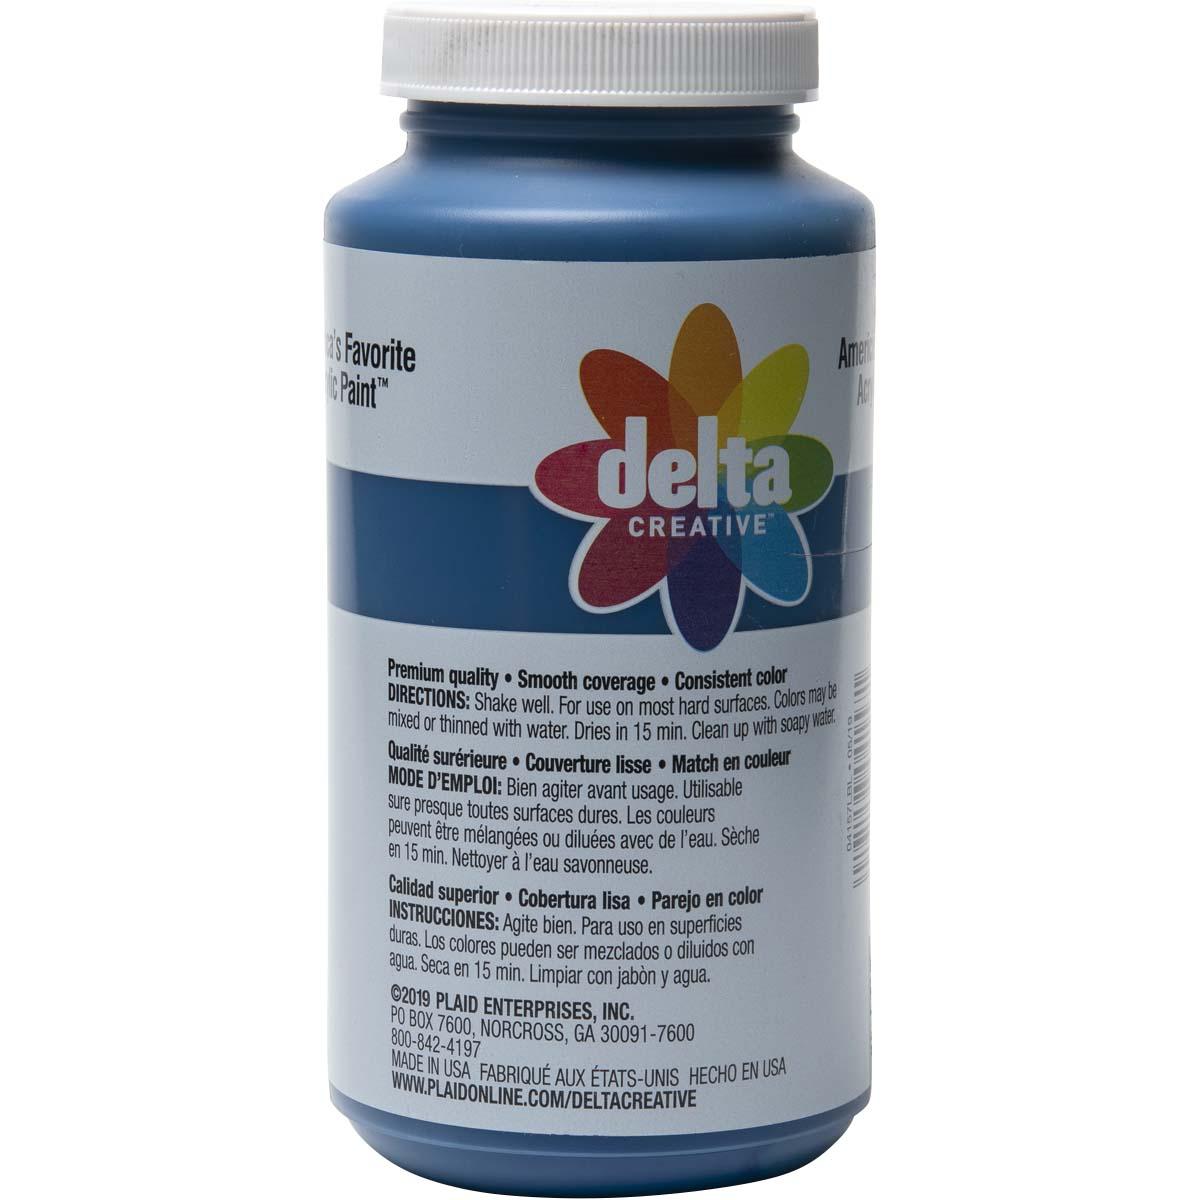 Delta Ceramcoat ® Acrylic Paint - Navy Blue, 16 oz. - 04157